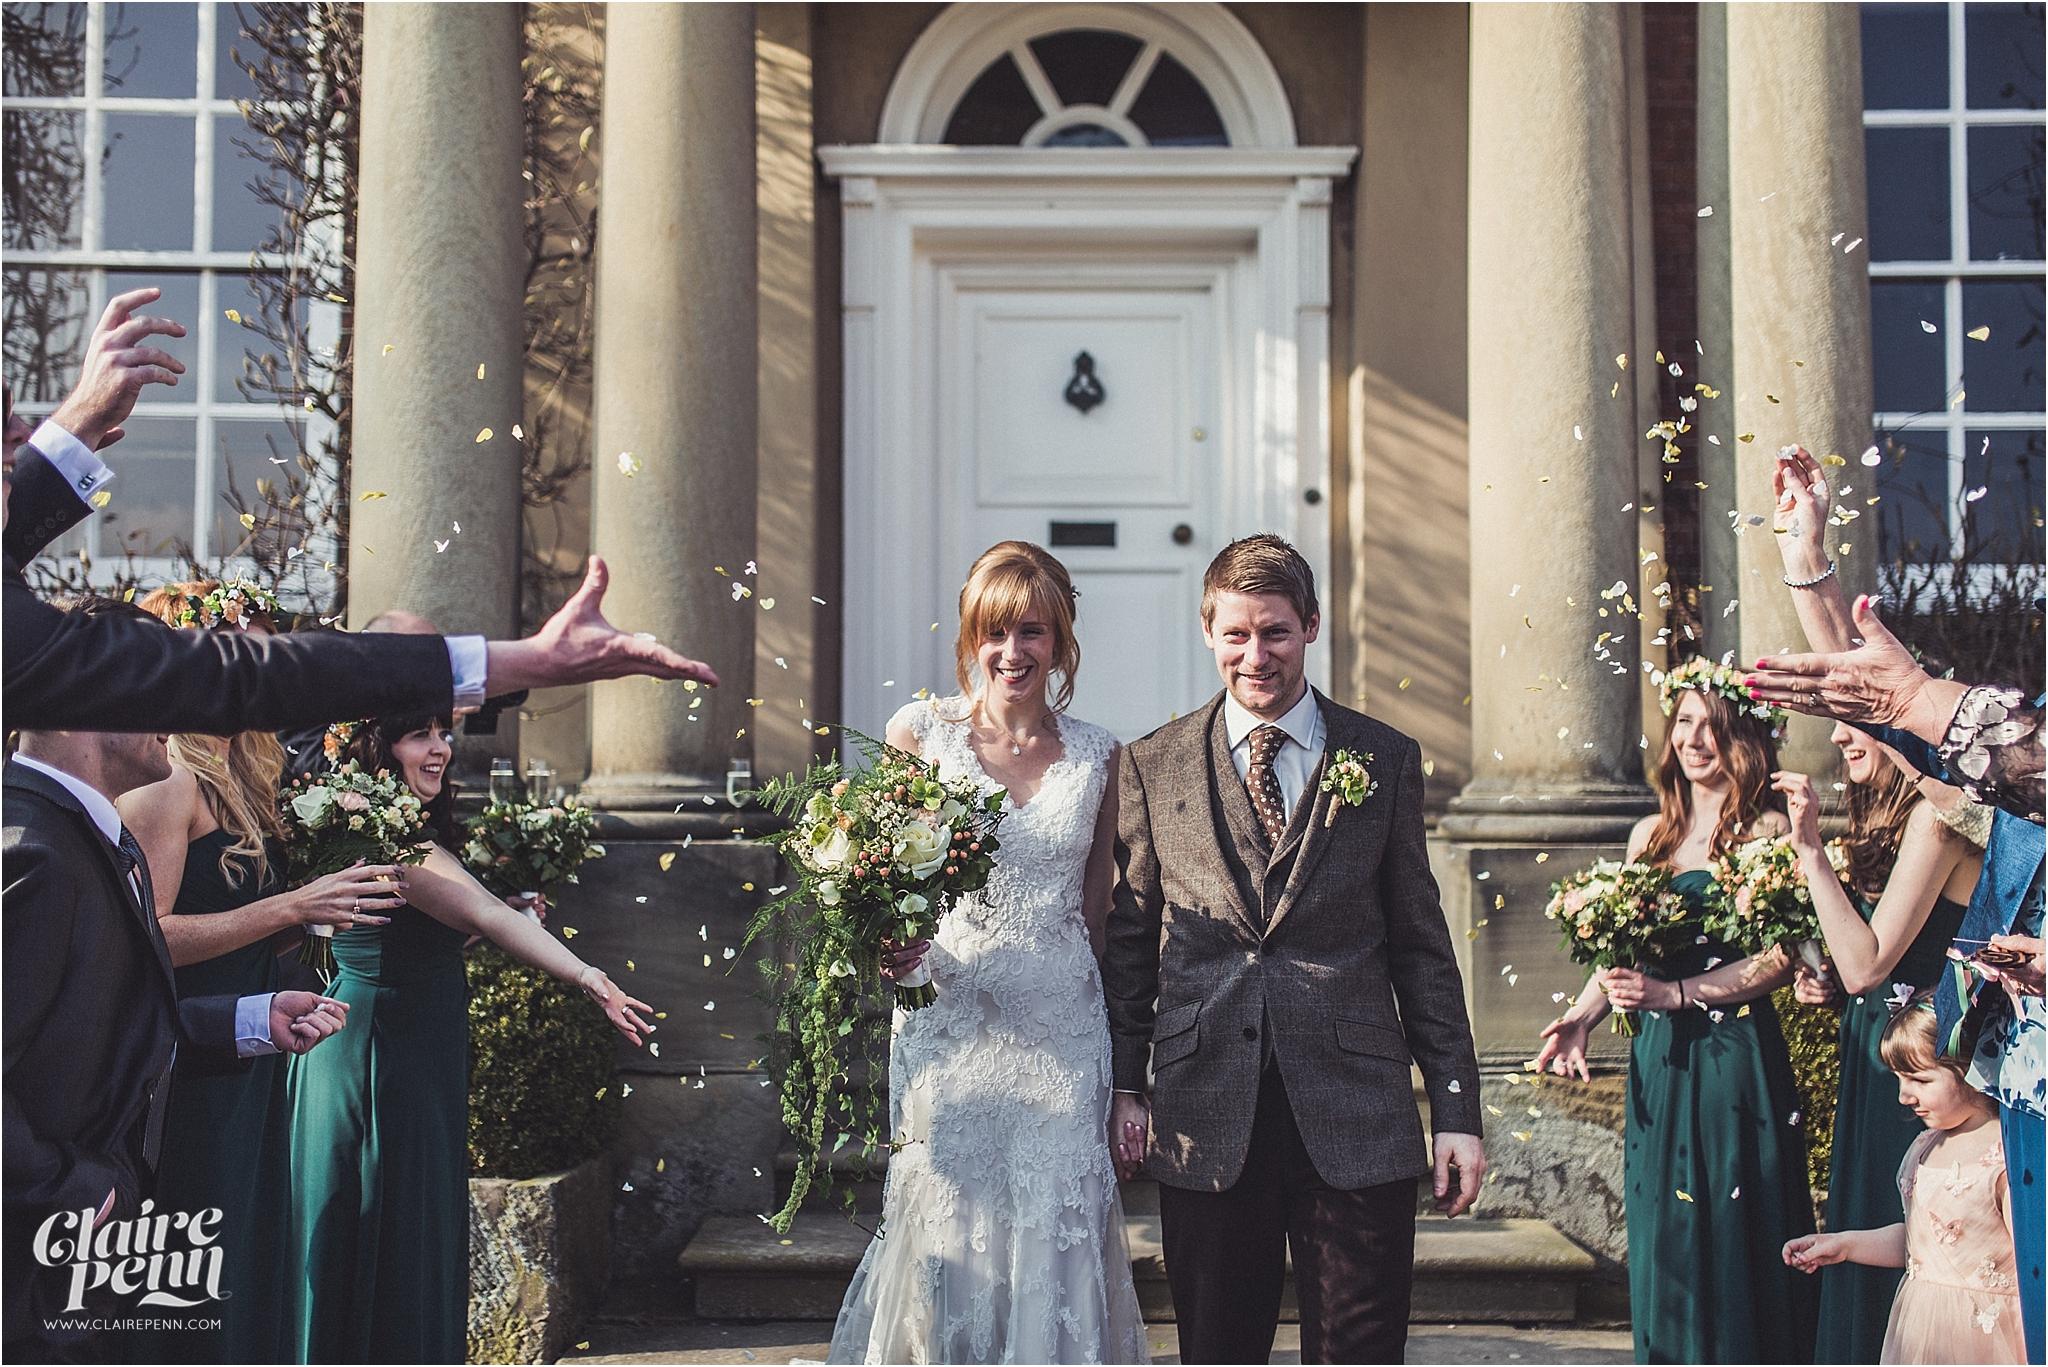 Iscoyd Park wedding, Whitchurch, Cheshire wedding photographer_0025.jpg